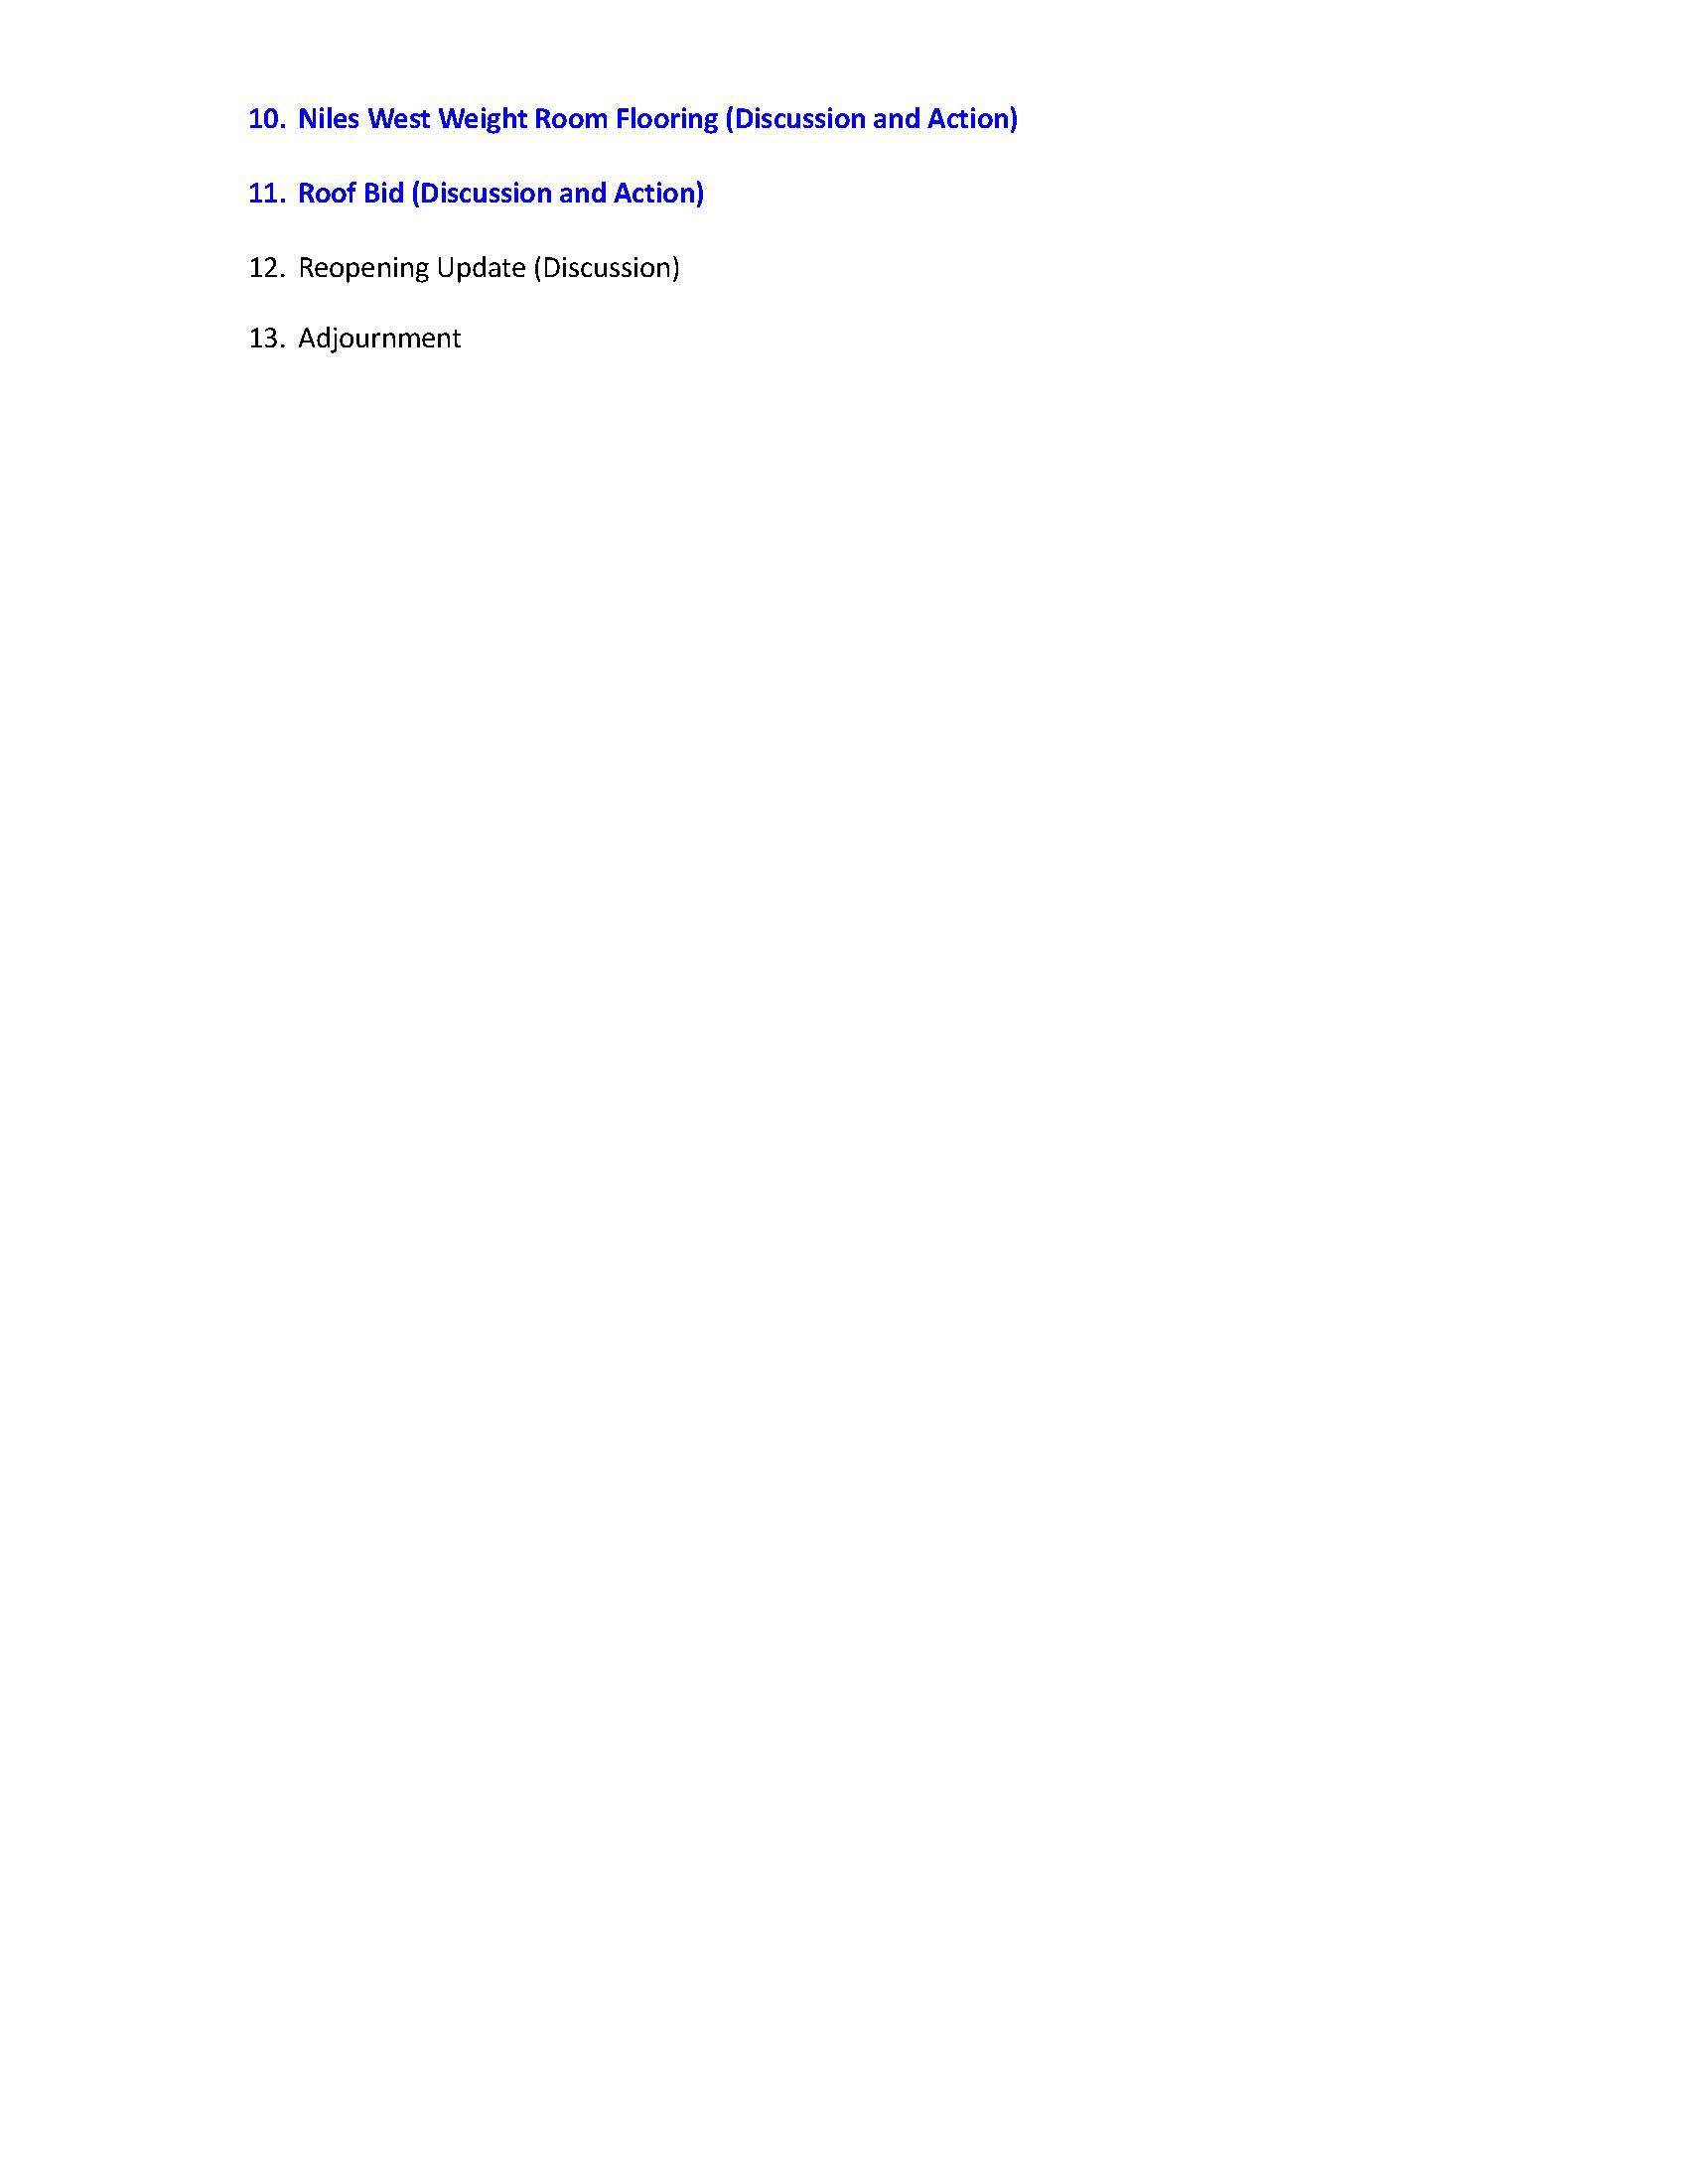 BOE 2-23-21 Agenda P2